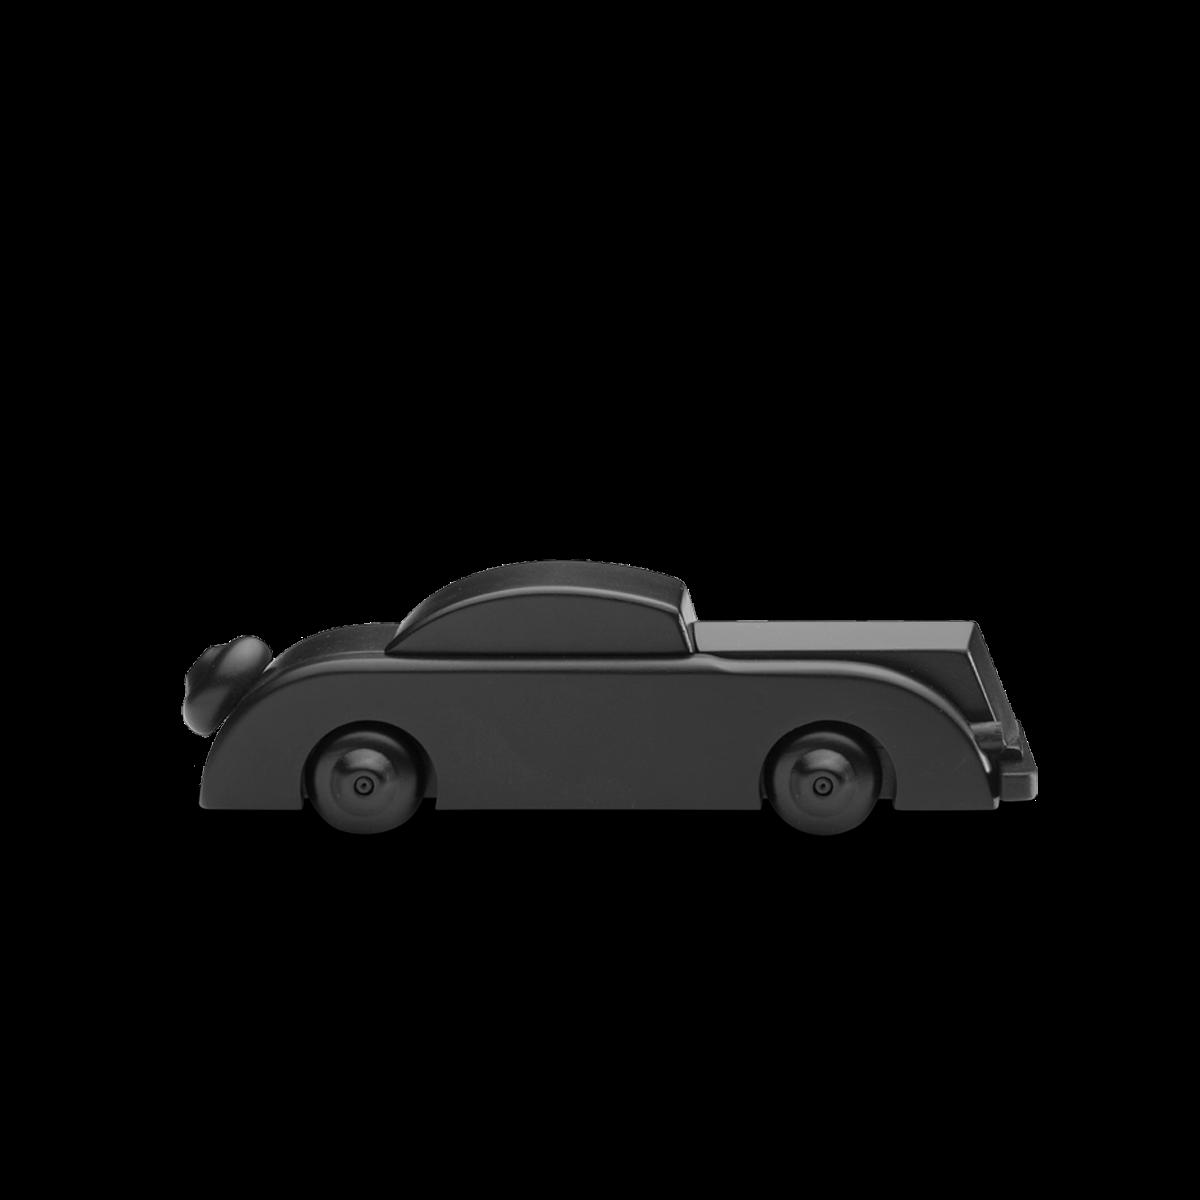 Kay Bojesen - Limousine Small - Black (39218)